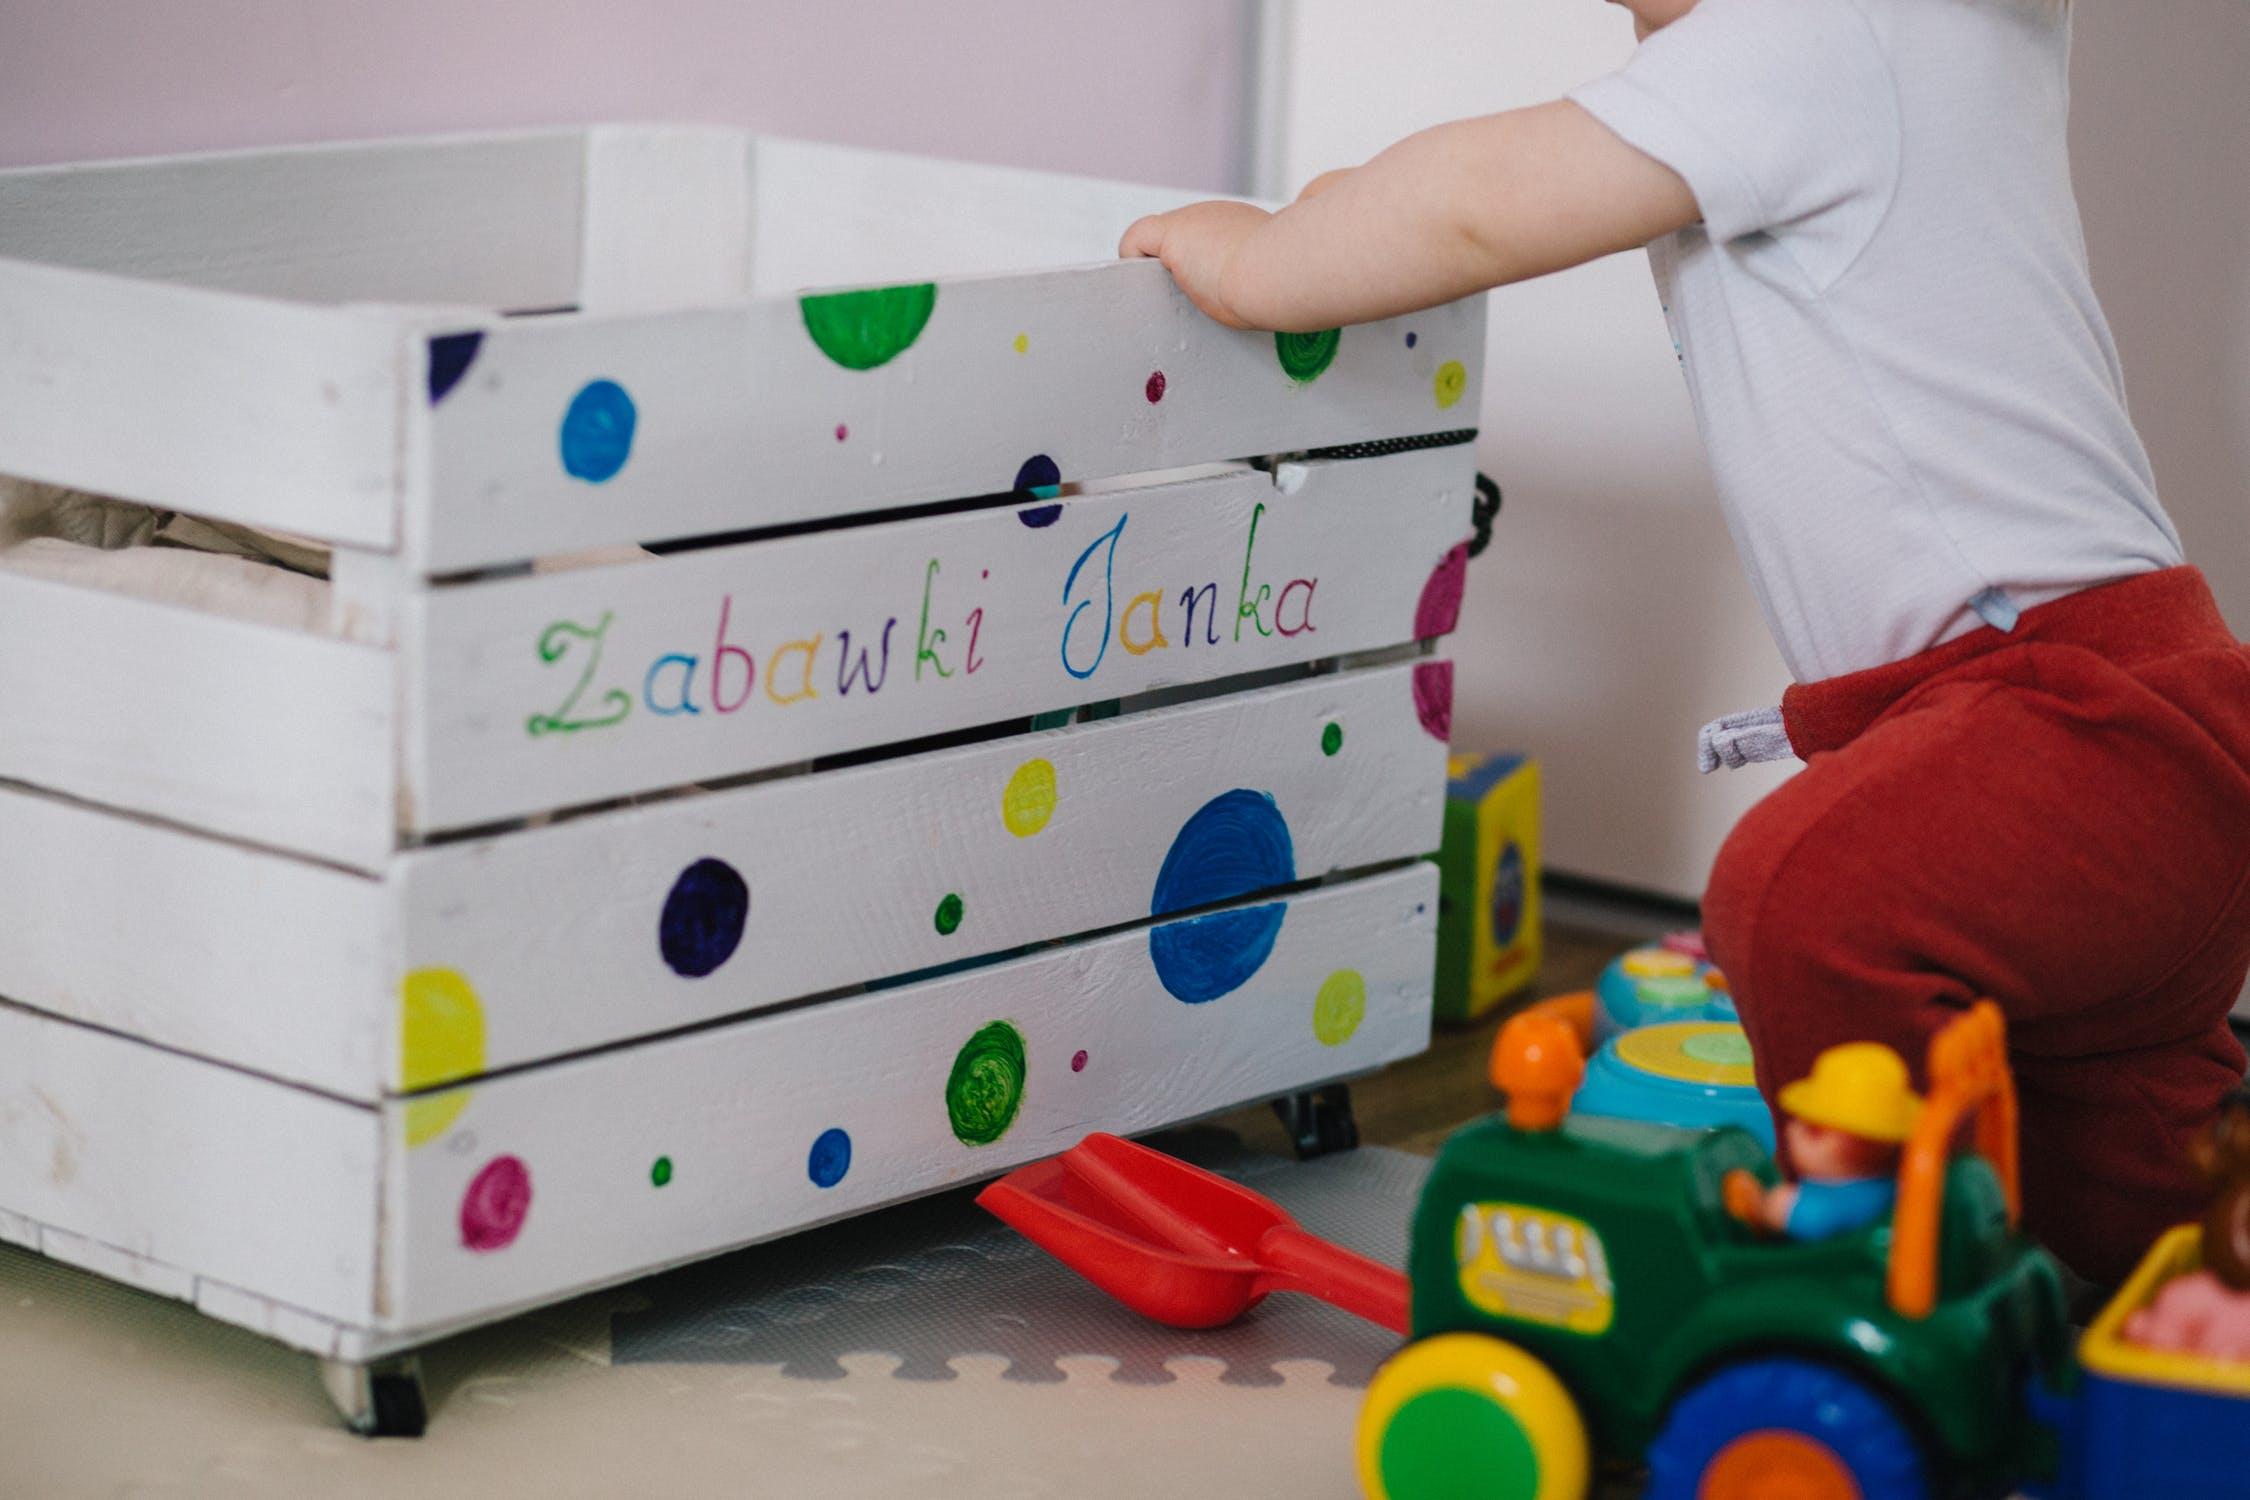 Baby brain development activities - play time